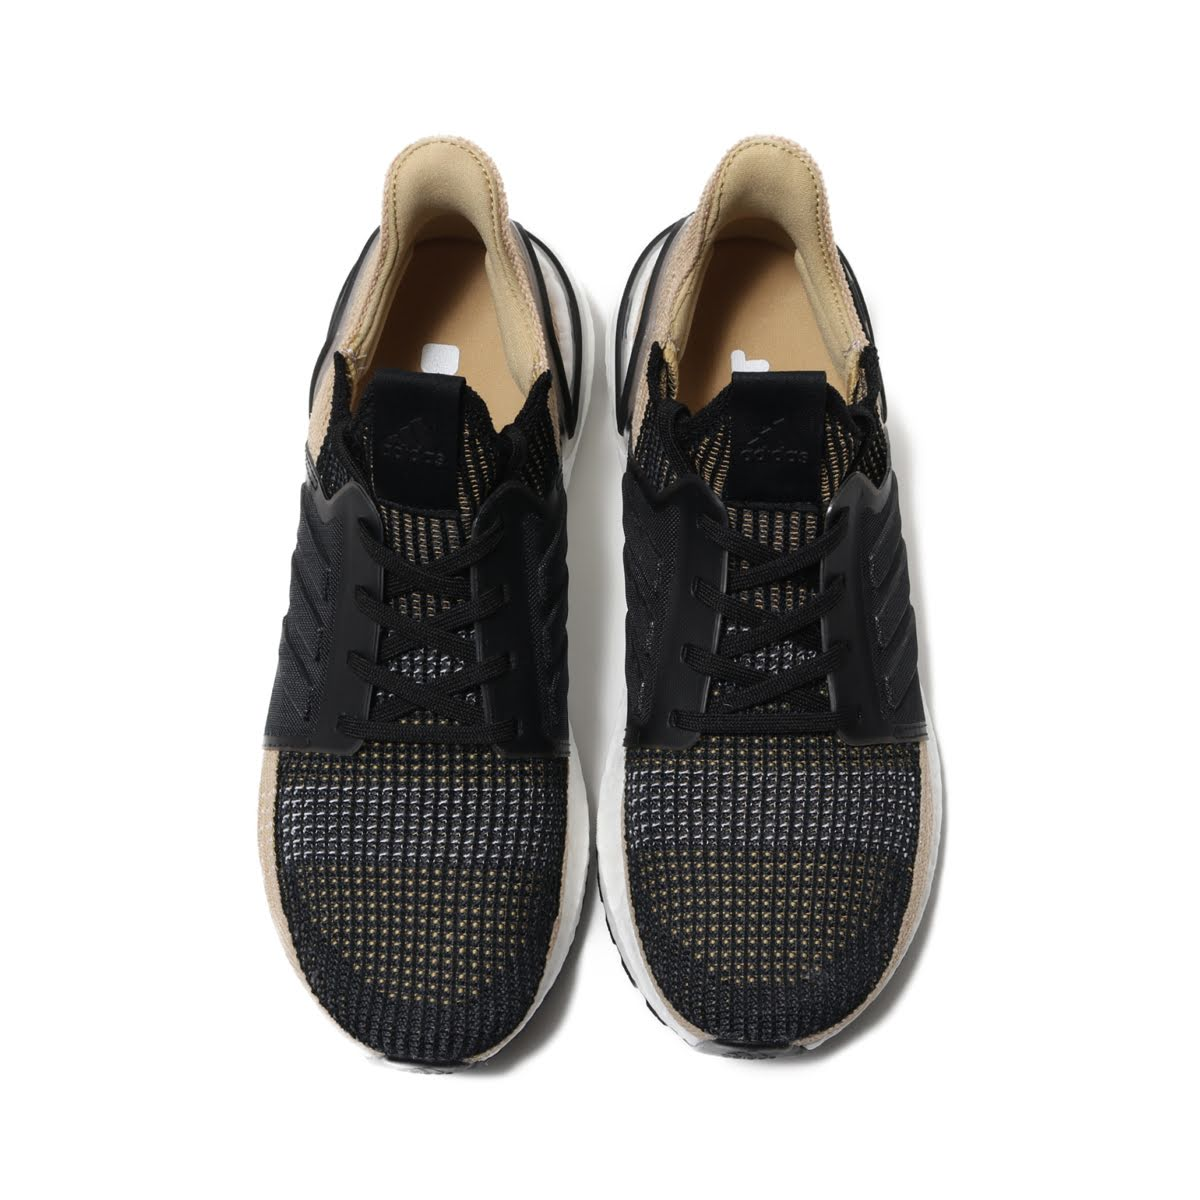 b739450c8dceb adidas UltraBOOST 19 (CORE BLACK RAW SAND GREY SIX) (Adidas ultra boost 19)